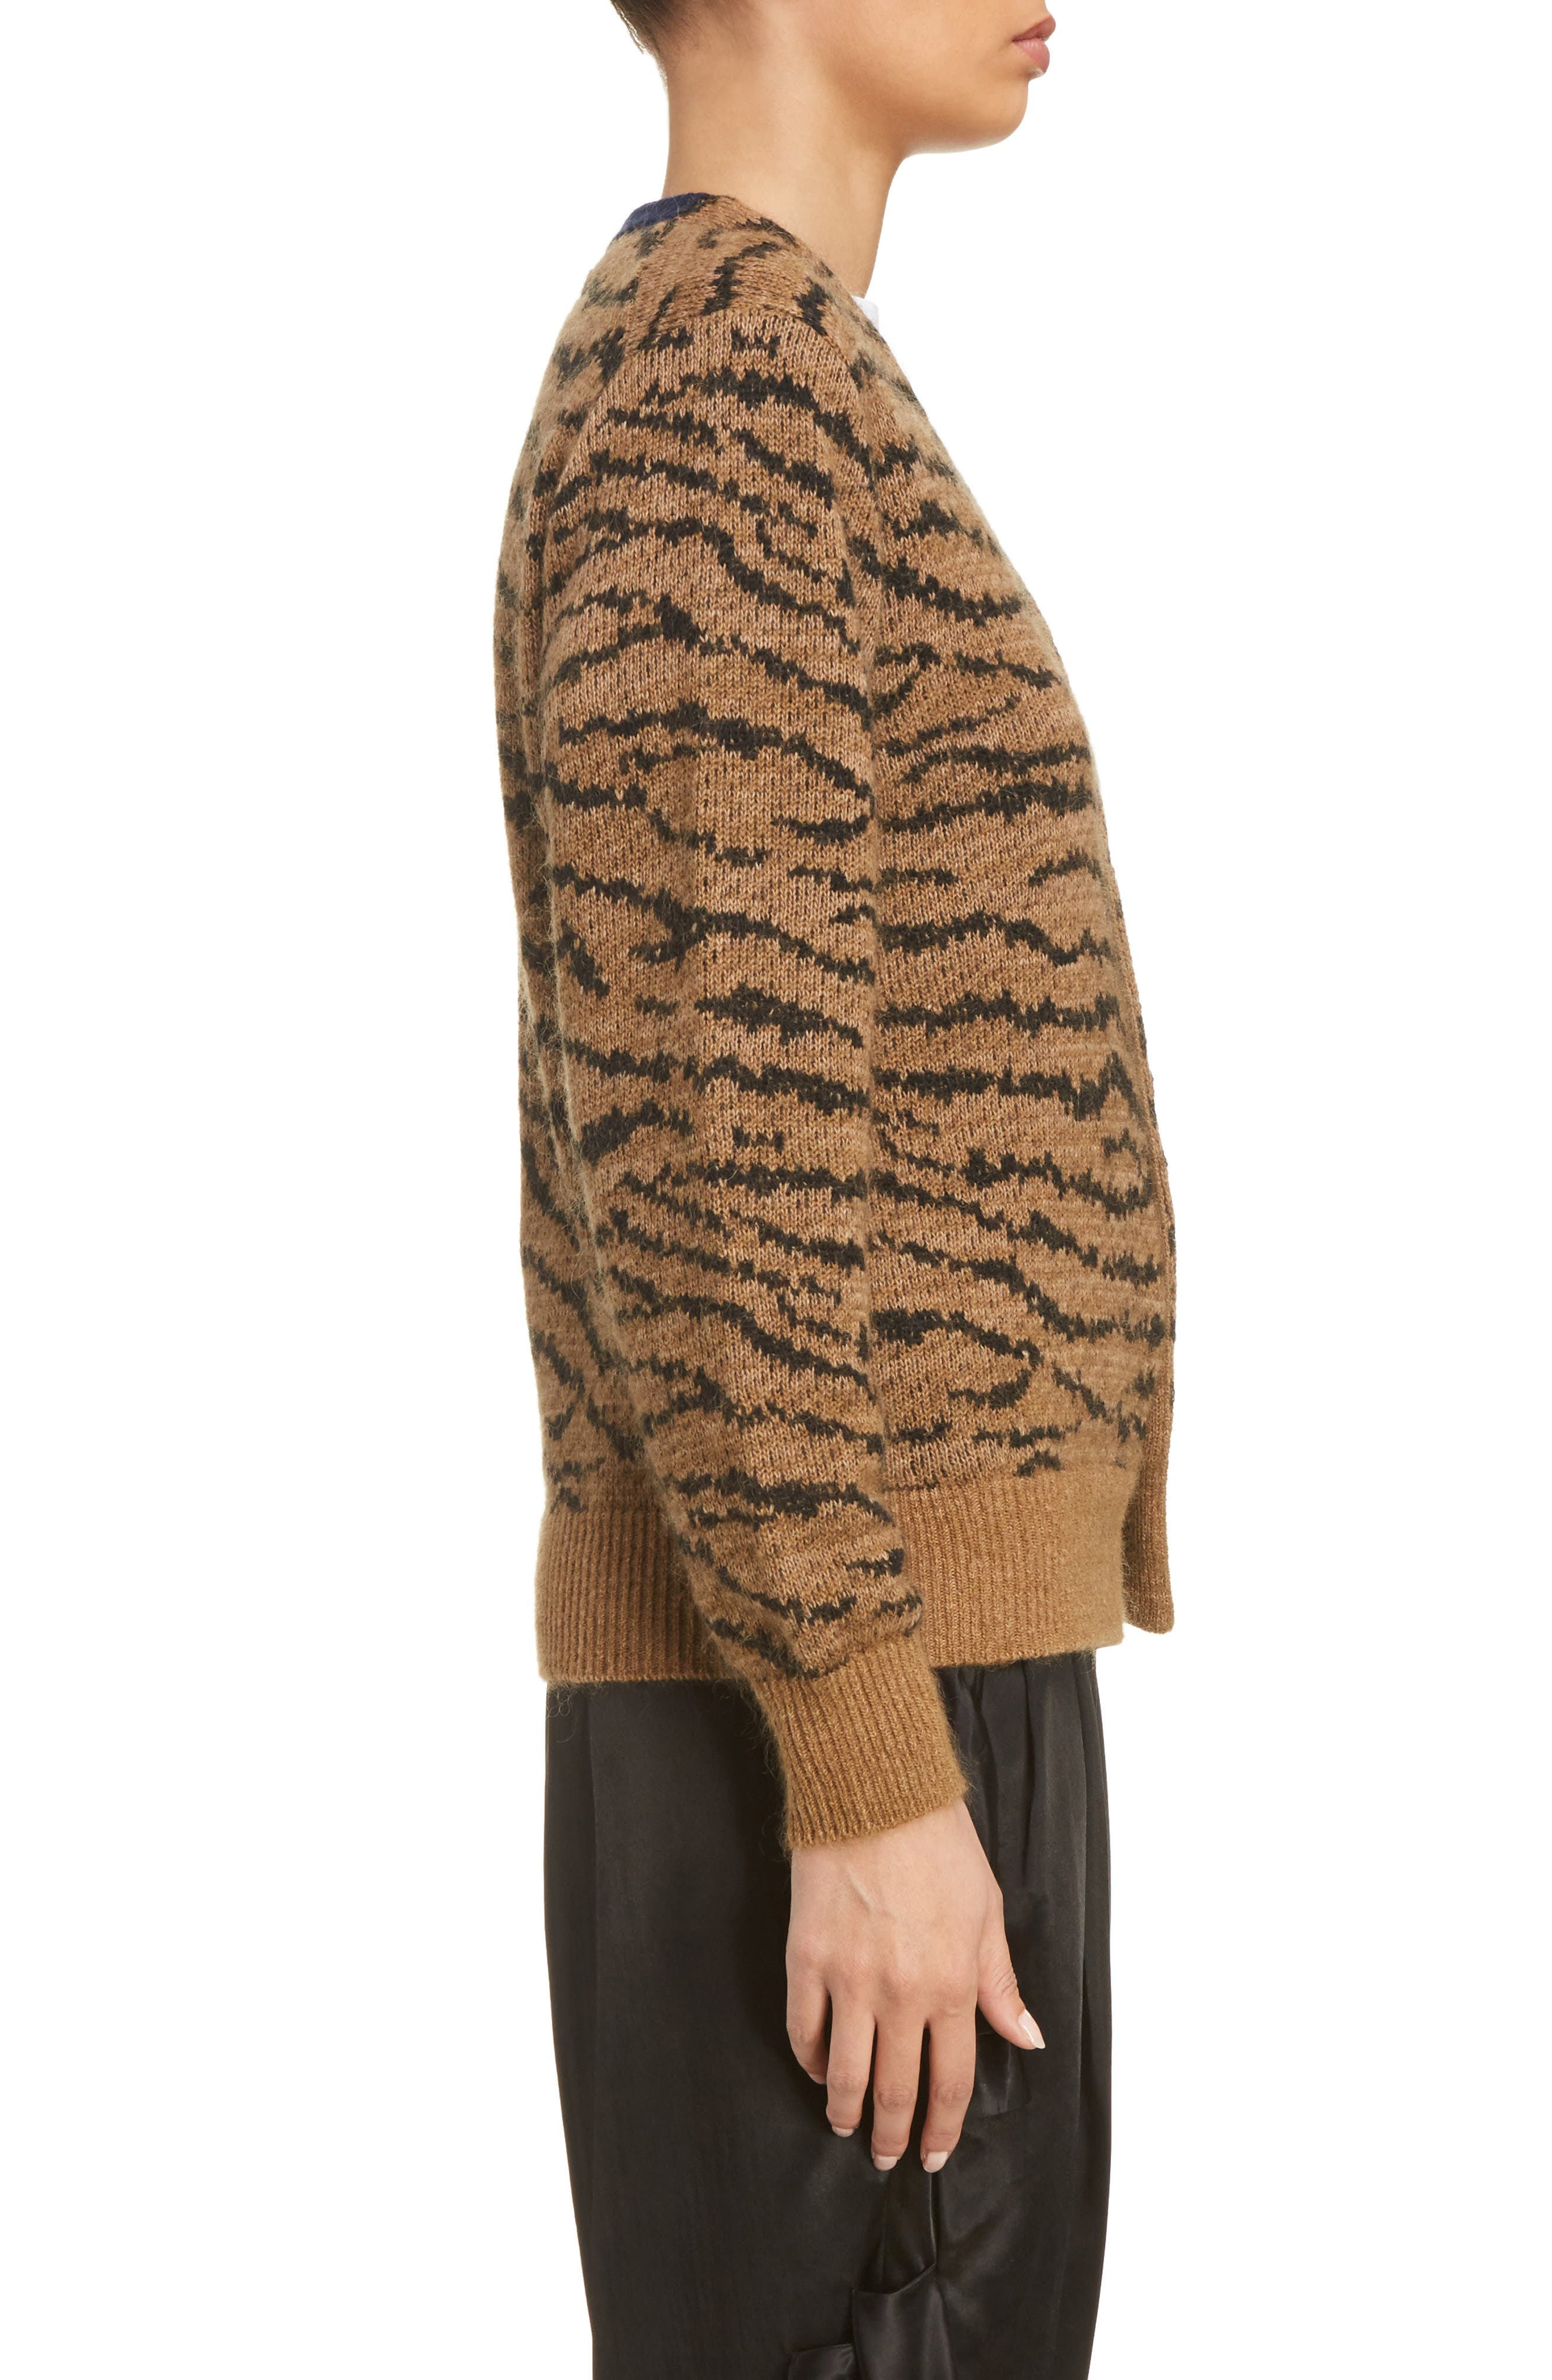 Tiger Jacquard Knit Button Cardigan,                             Alternate thumbnail 4, color,                             Beige